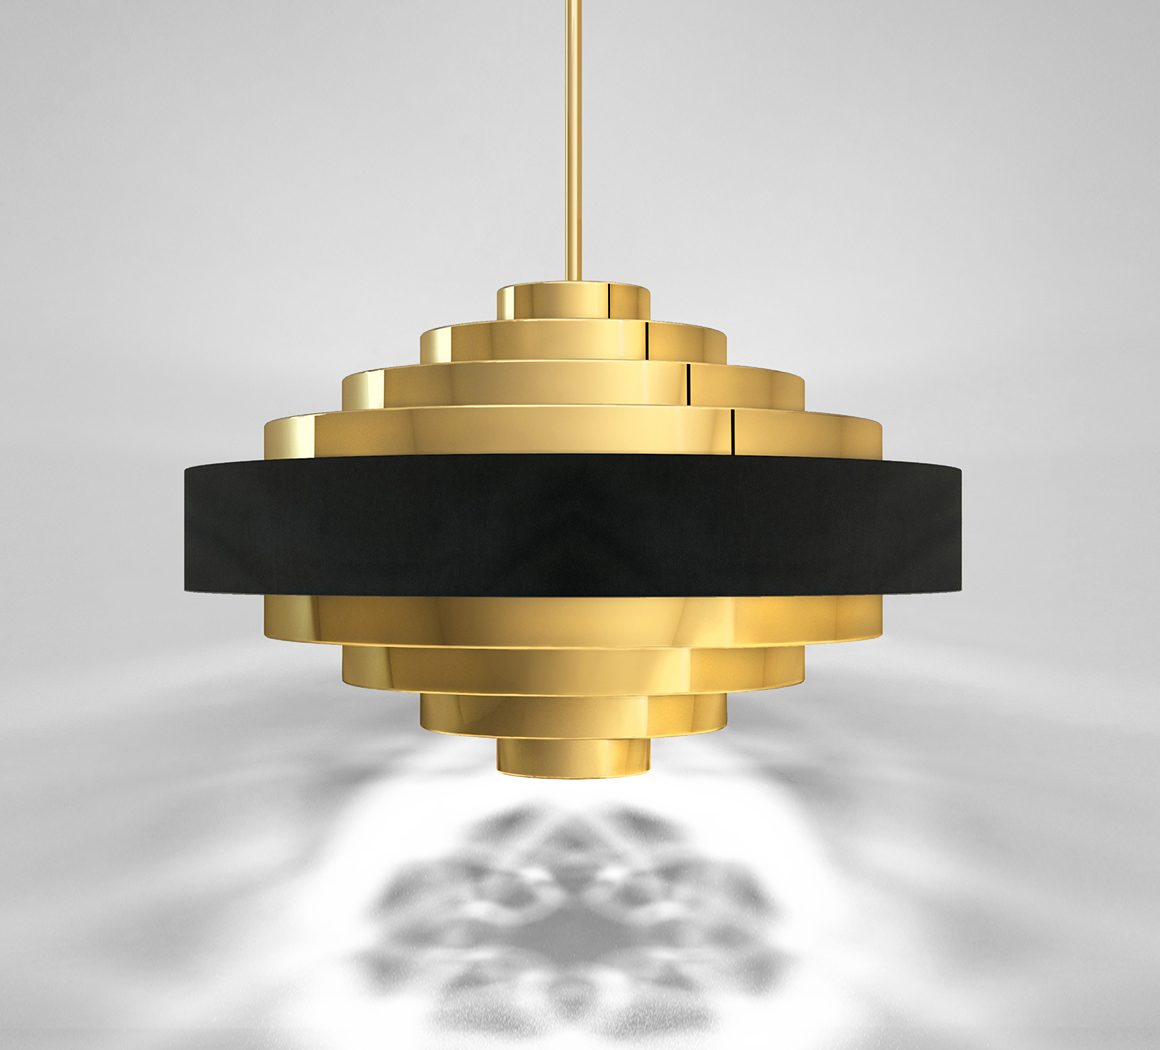 Furniture and Decoration – Interior Designer – Top of the line